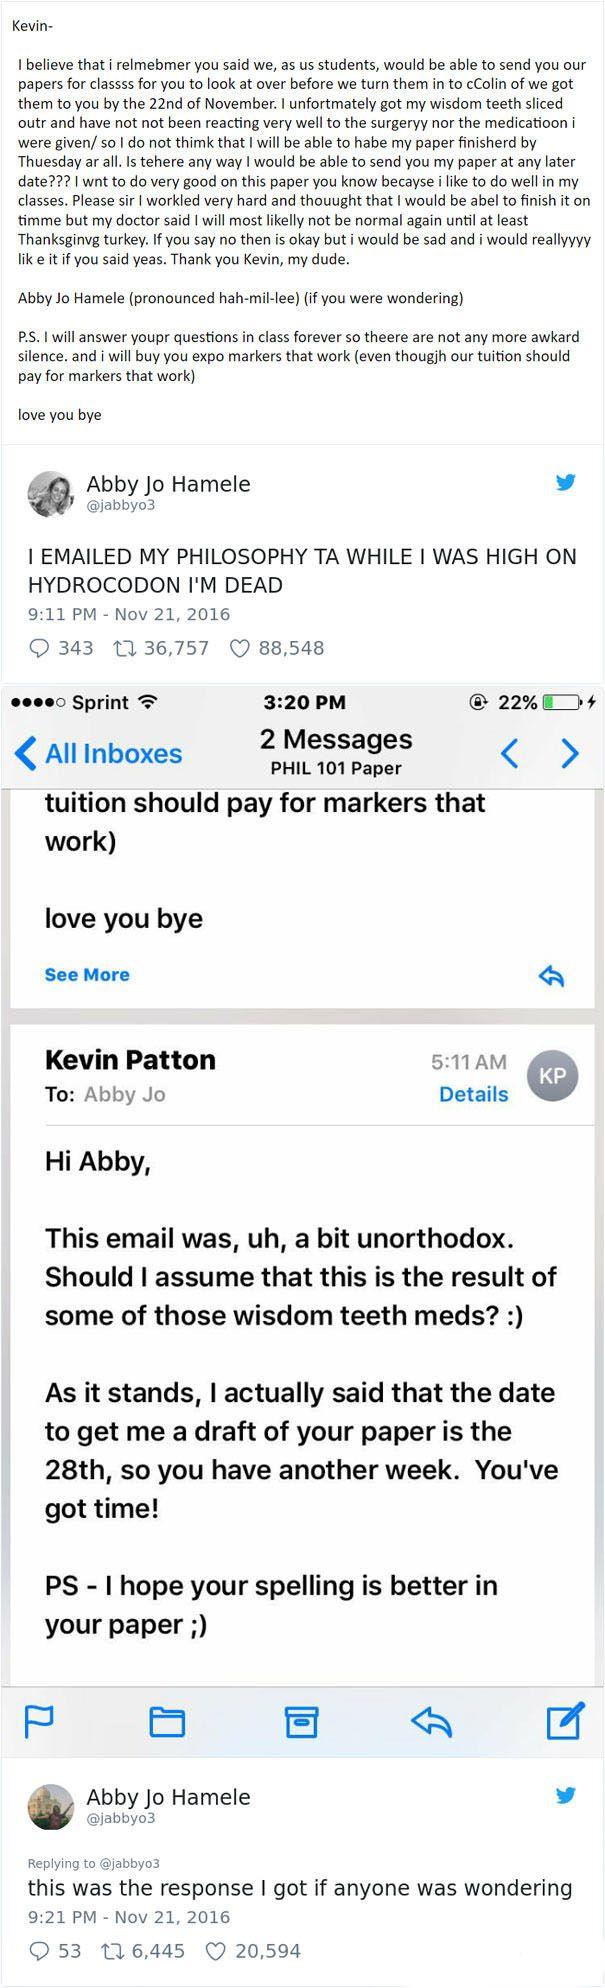 koodo how to send text via email